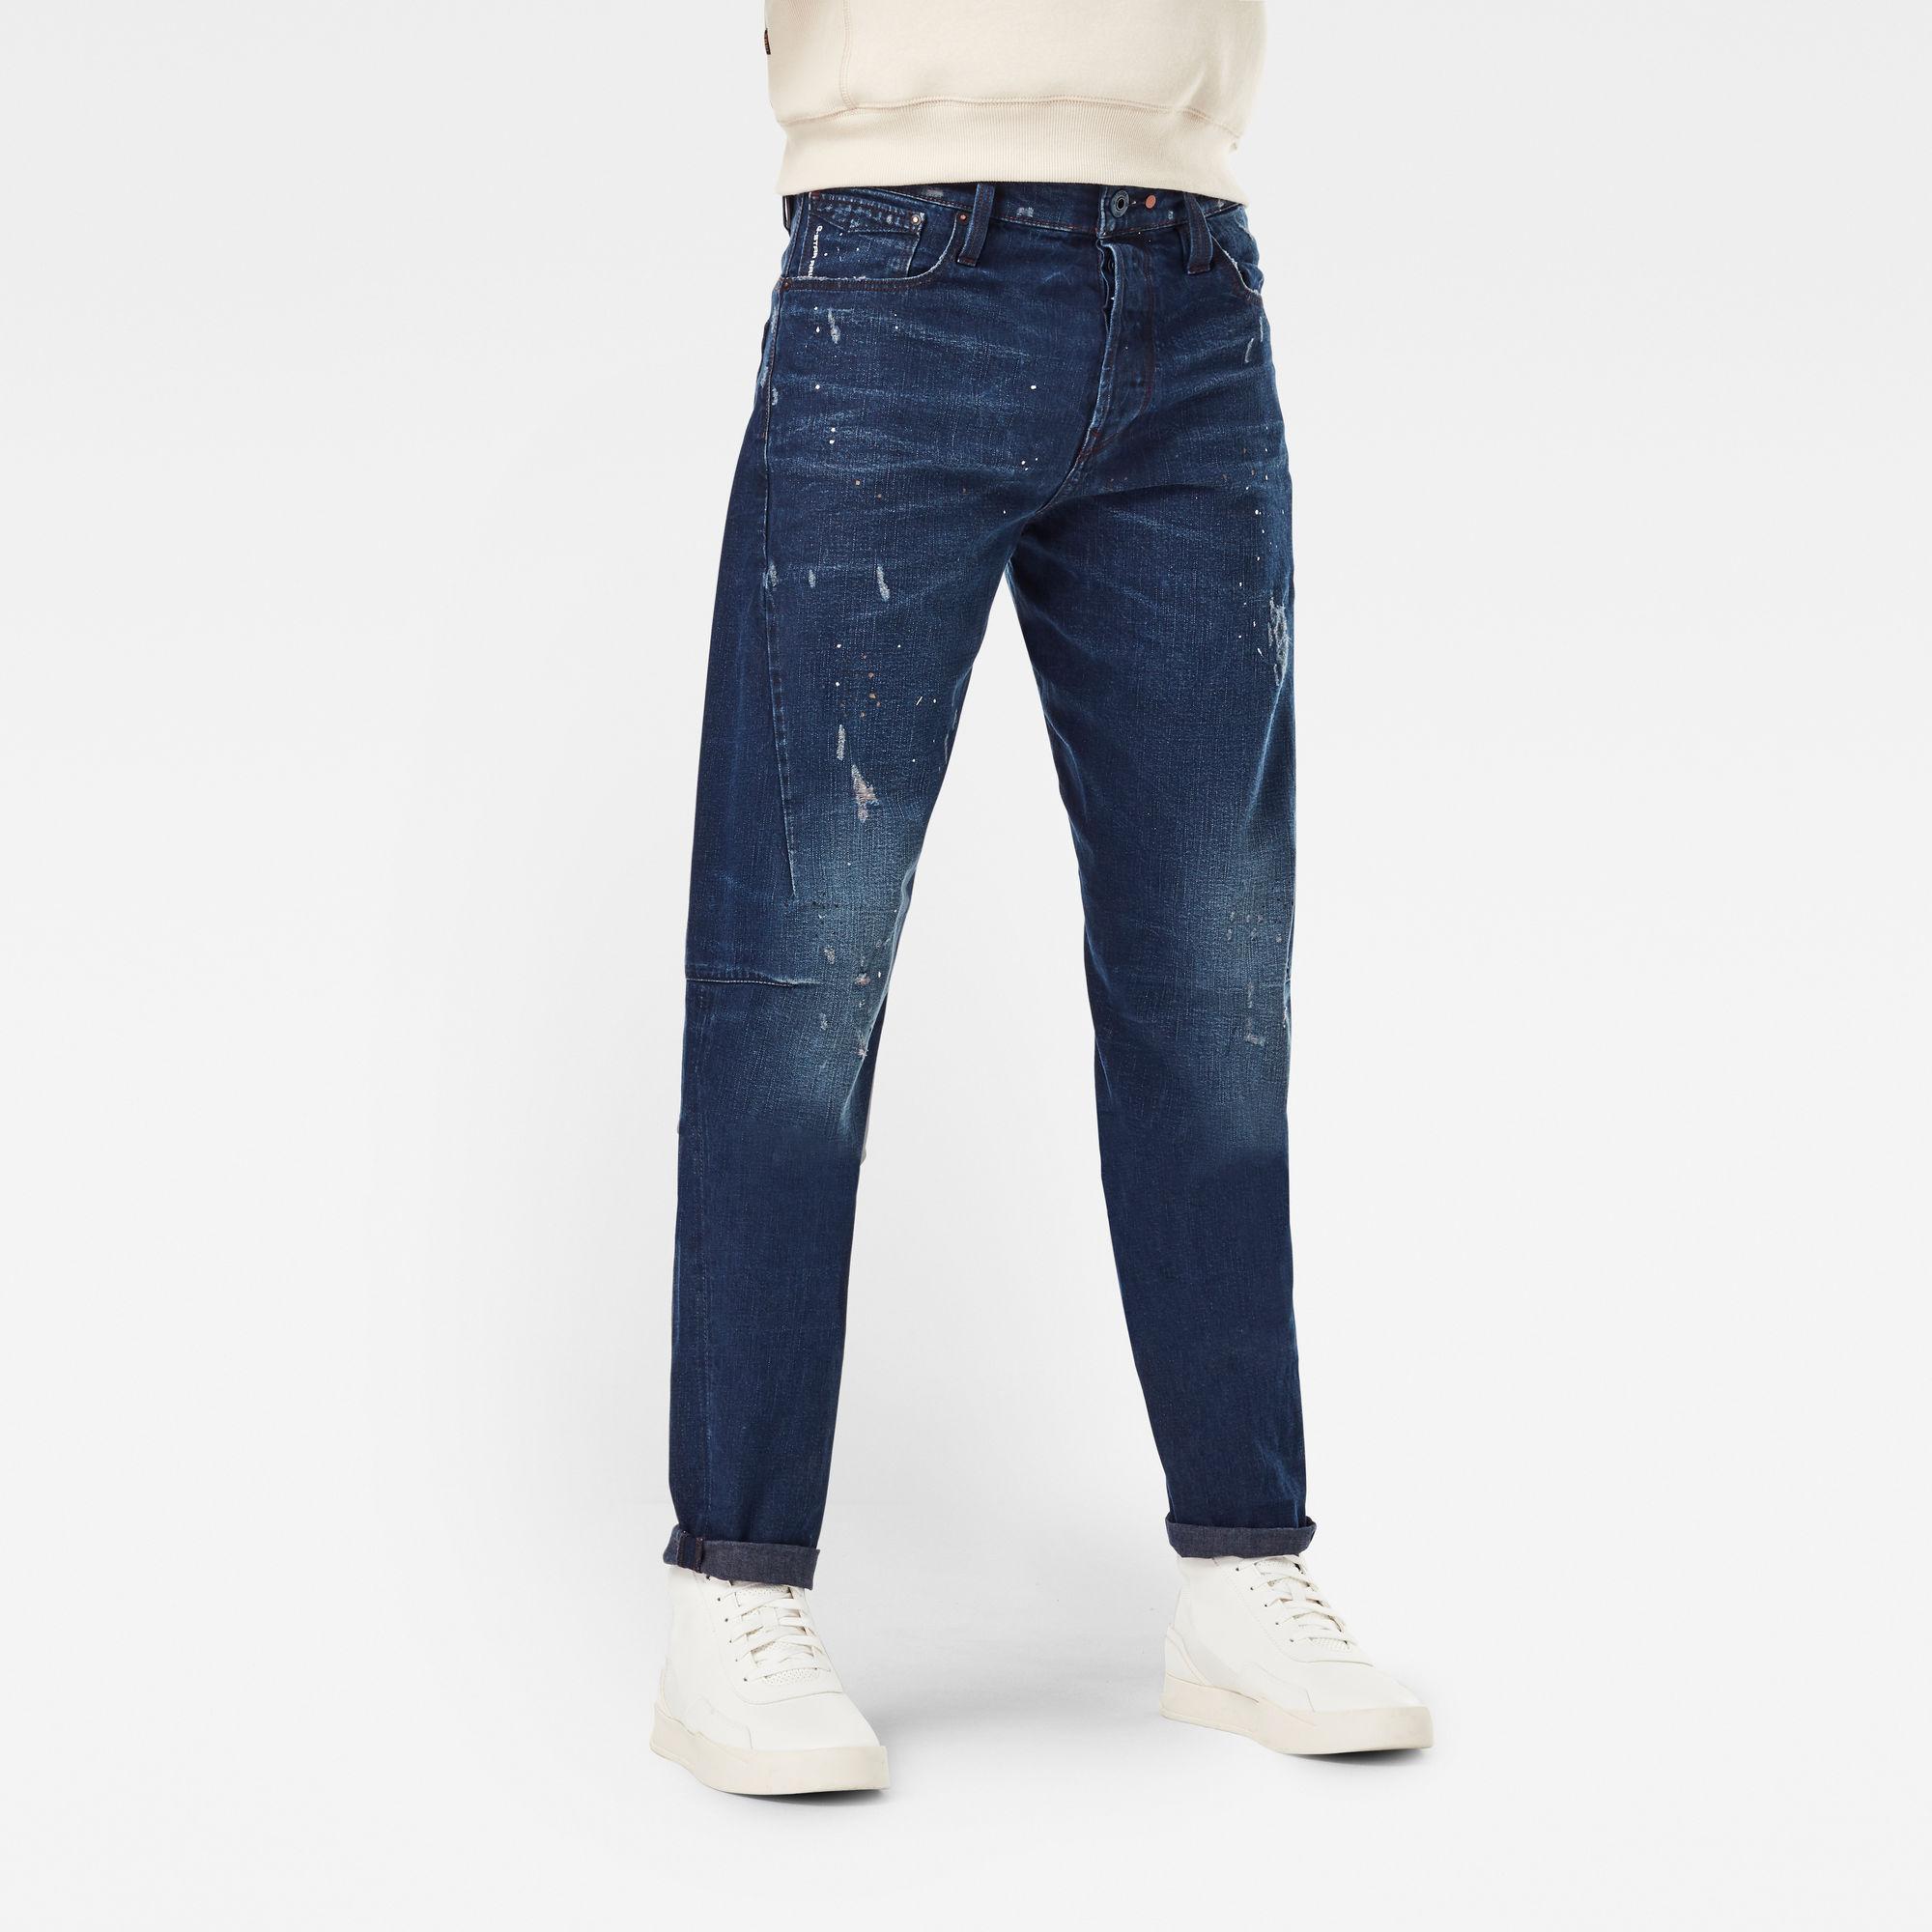 G-Star RAW Heren Scutar 3D Slim Tapered Jeans Donkerblauw